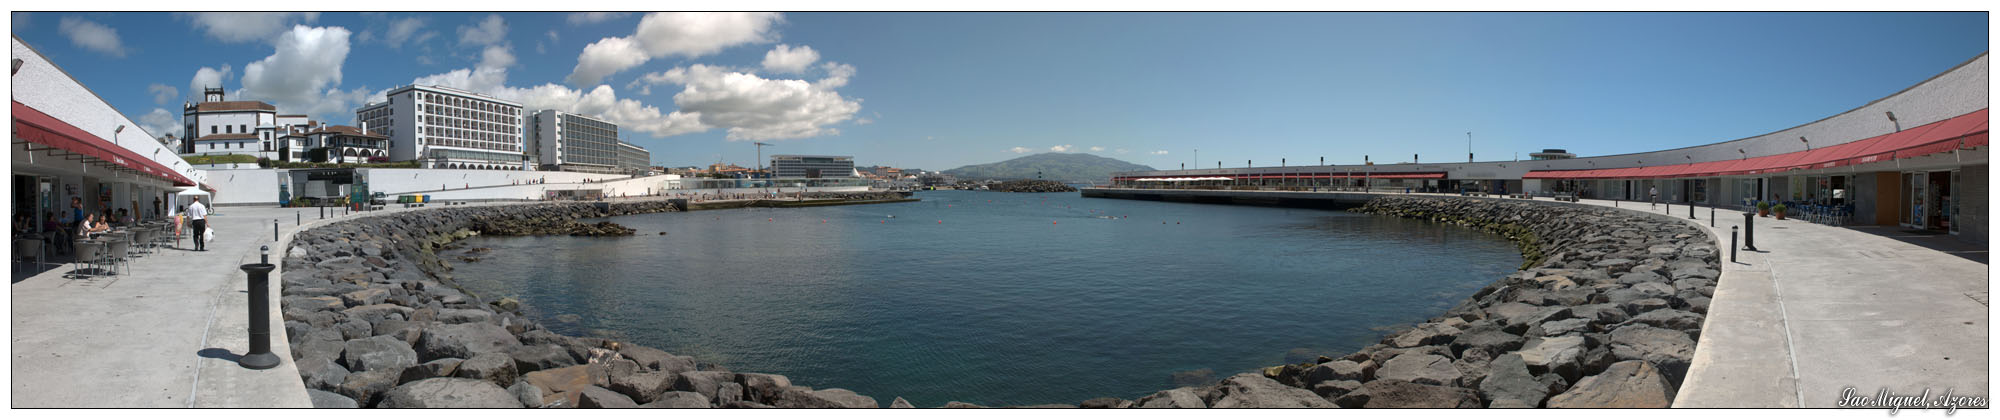 Portas do Mar in Ponta Delgada -2- (Sao Miguel, Azoren)